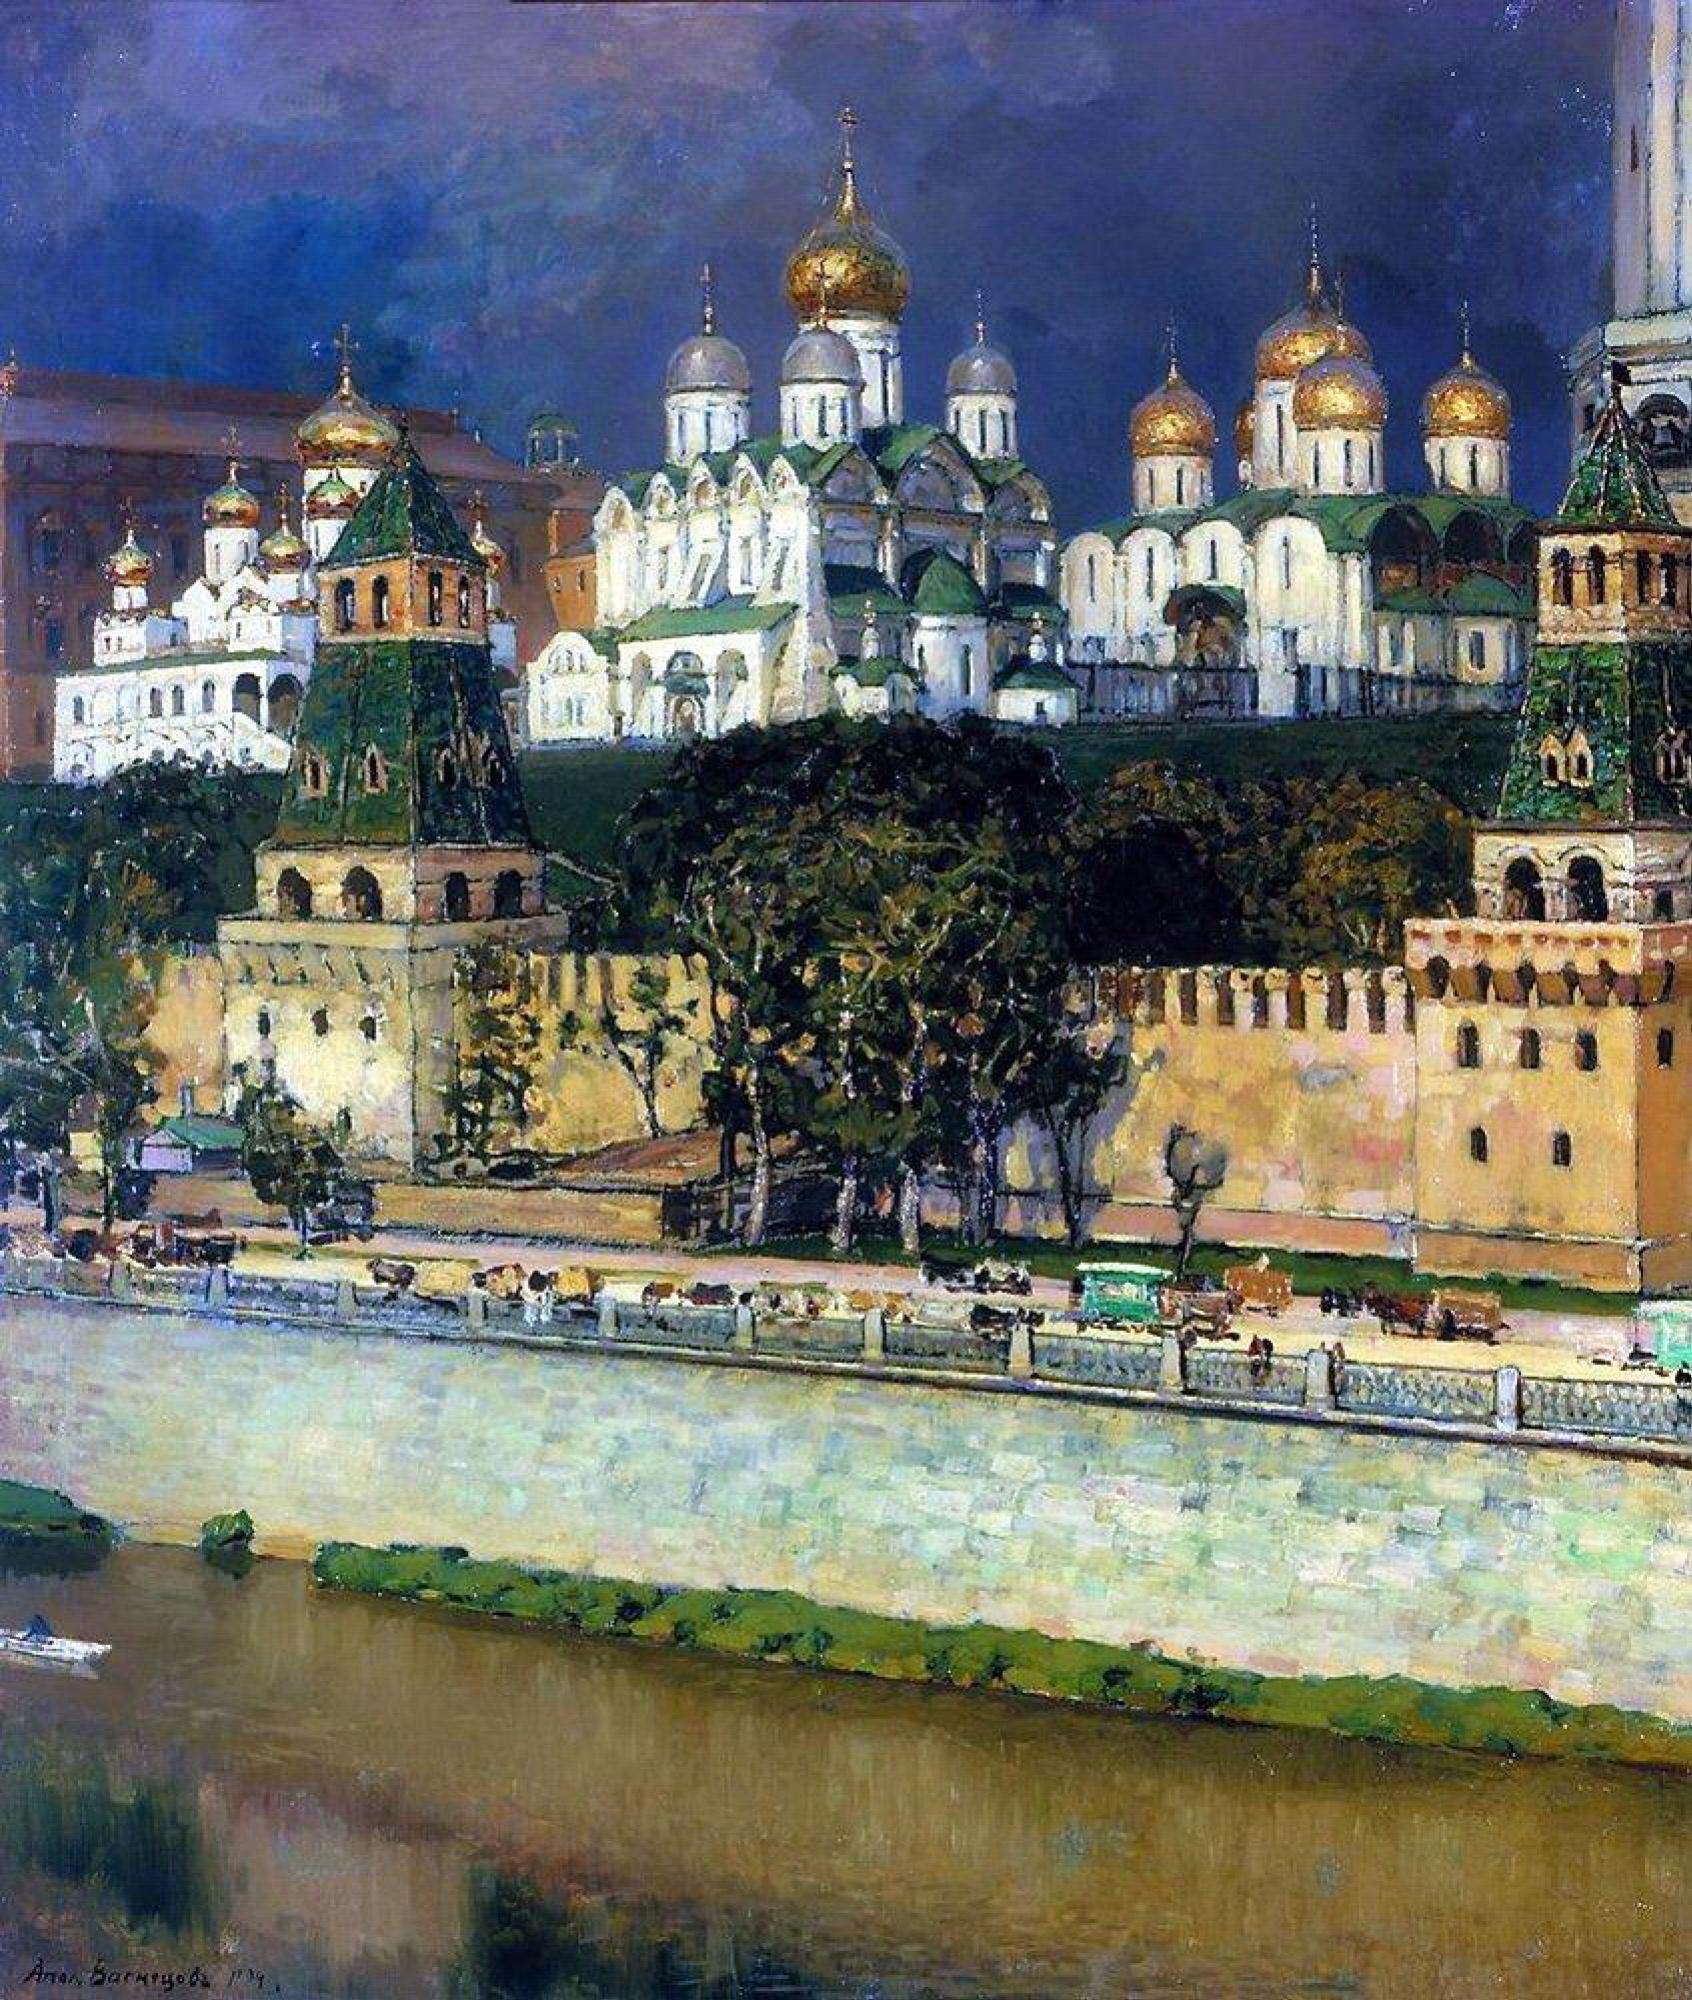 Аполлинарий Михайлович Васнецов. Московский Кремль